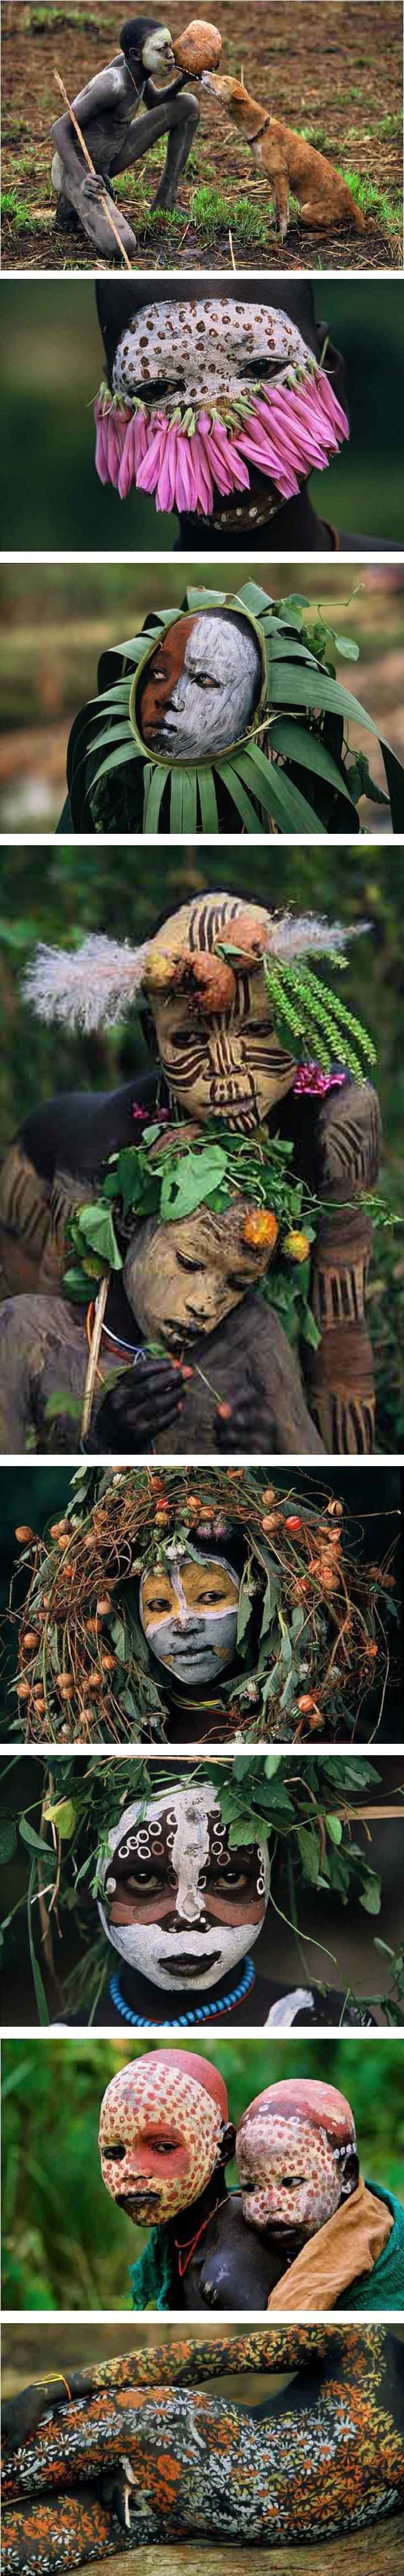 Etiopia, Le tribù della valle de l'OMO